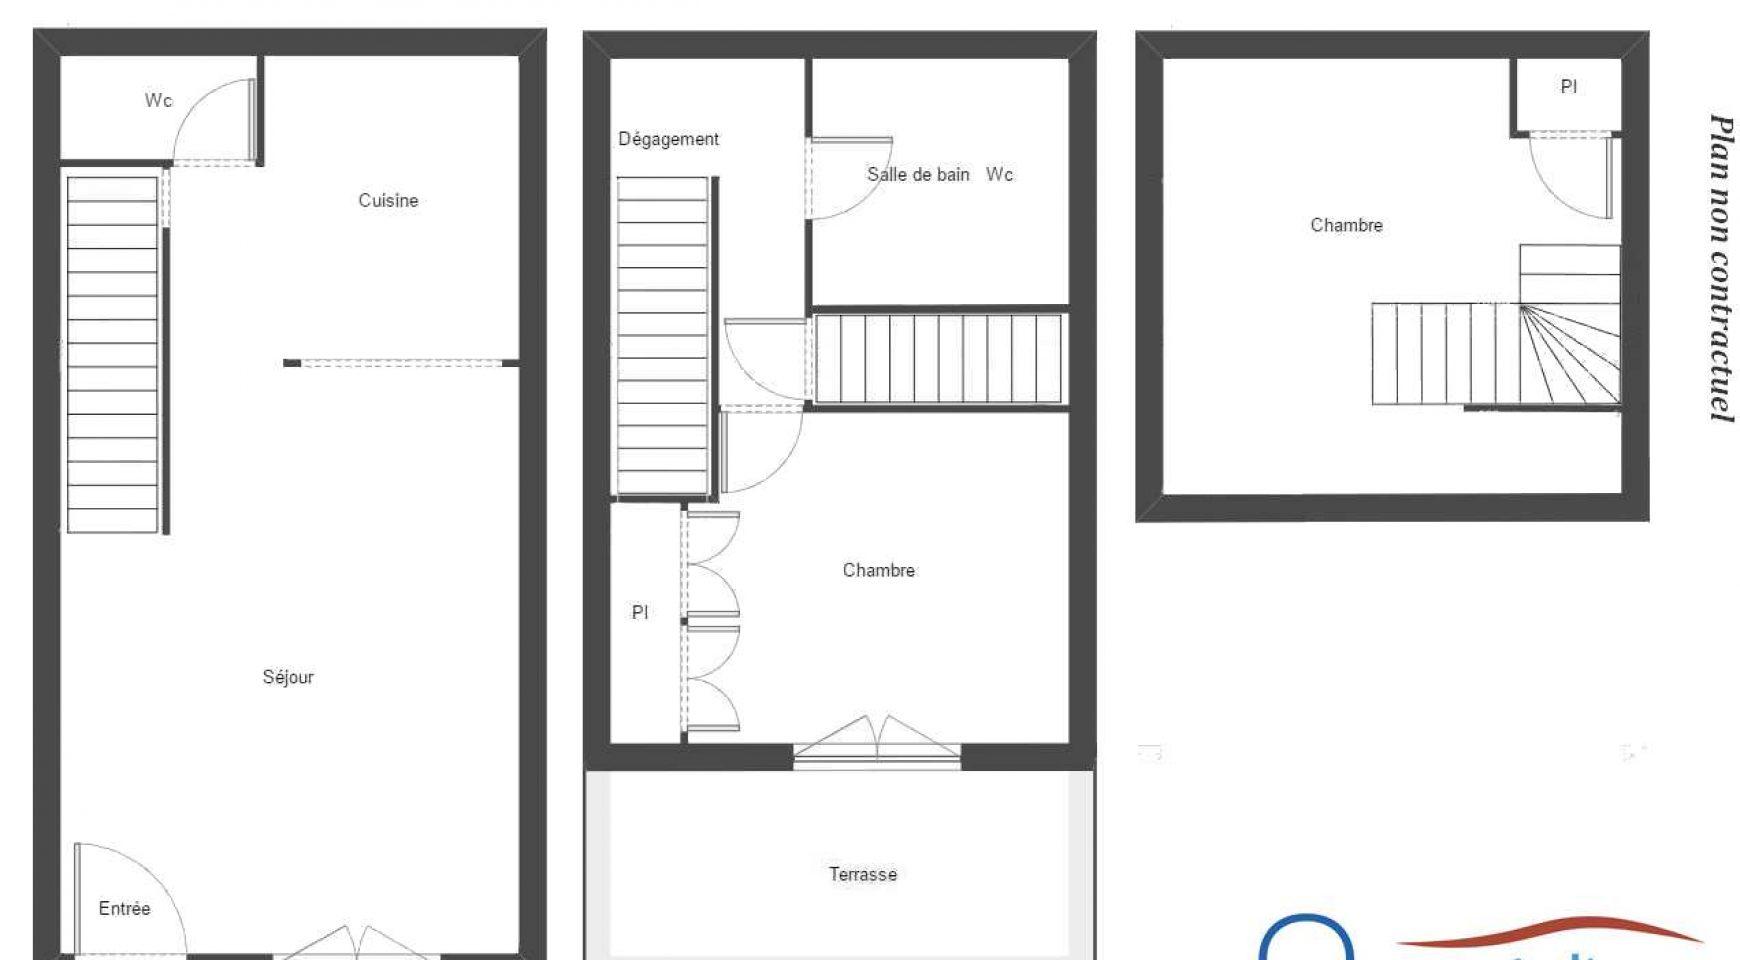 achat plan maison amazing exemple de plan with achat plan